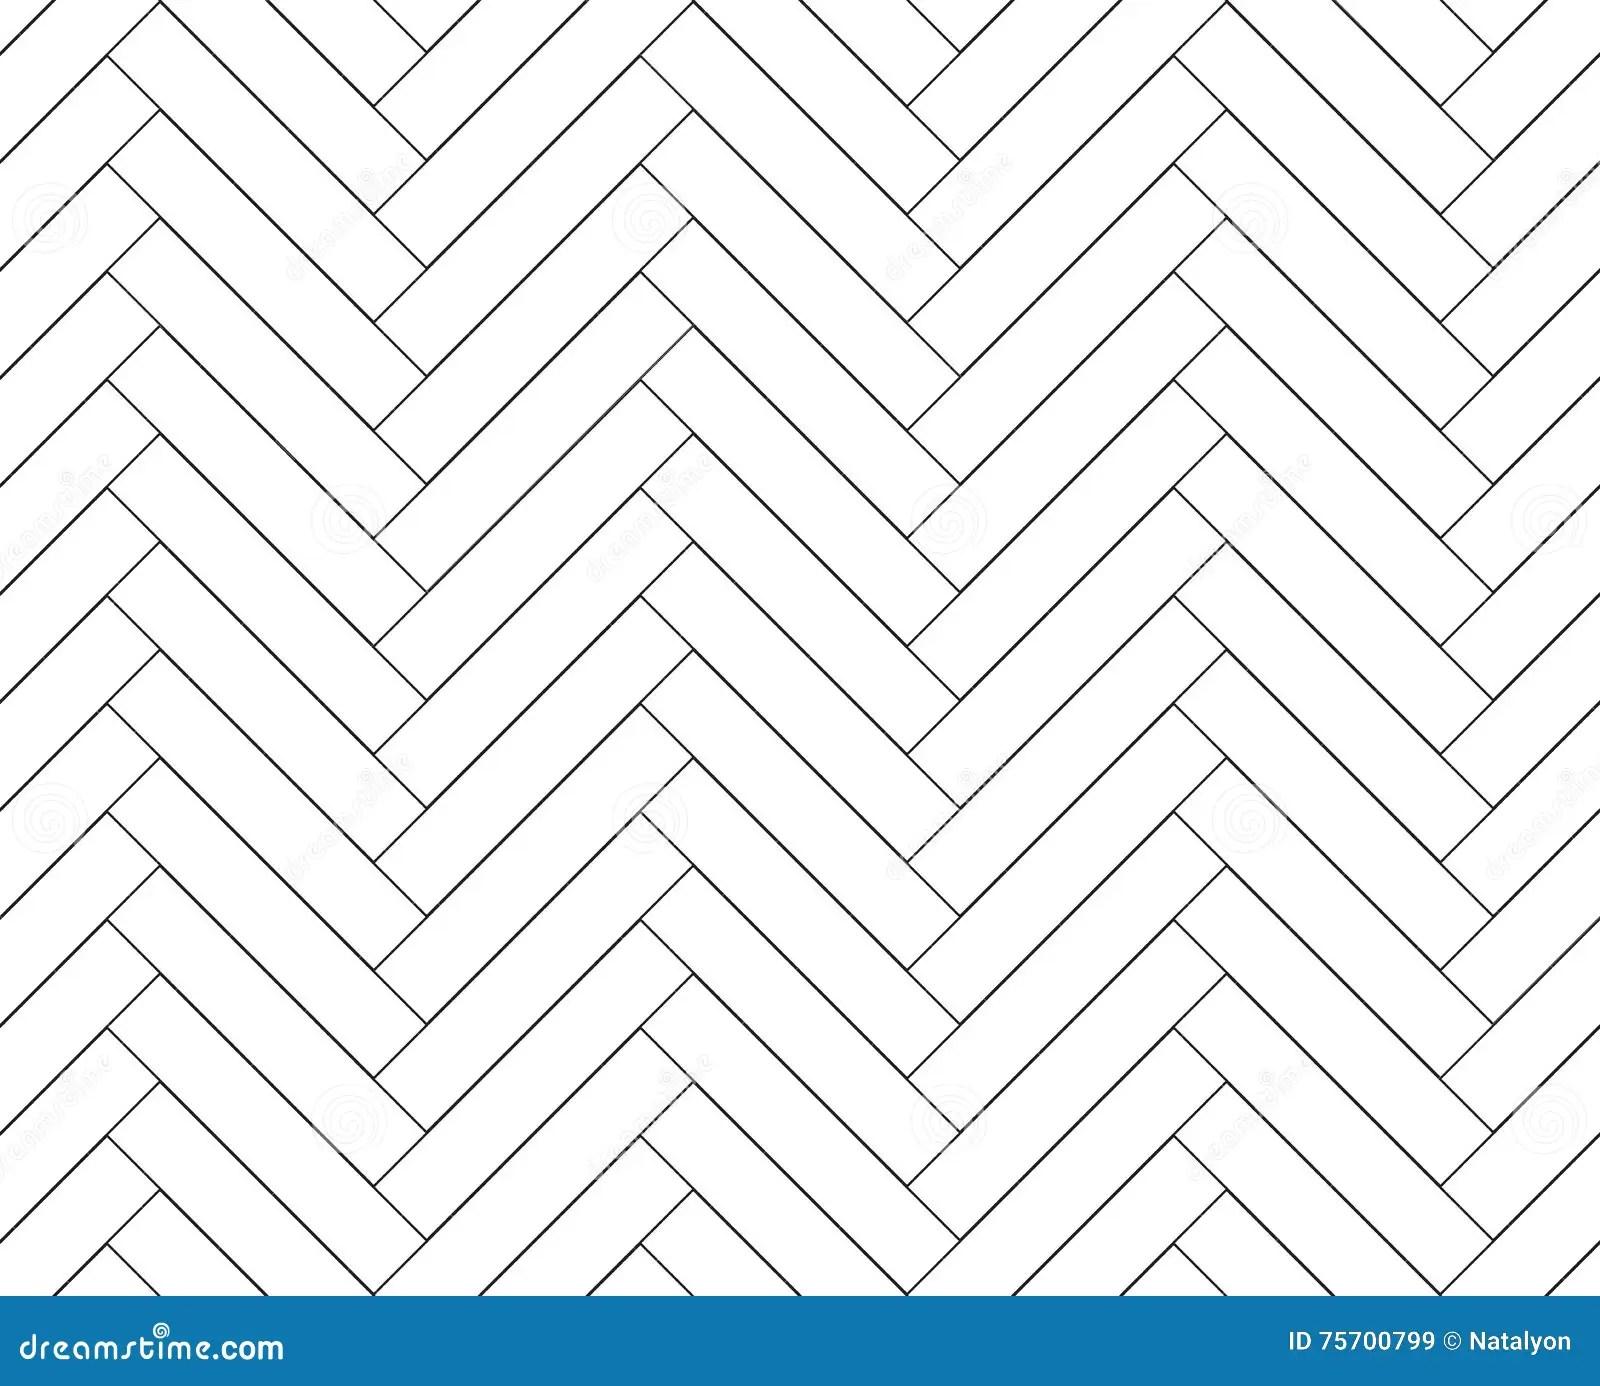 Black And White Simple Wooden Floor Herringbone Parquet